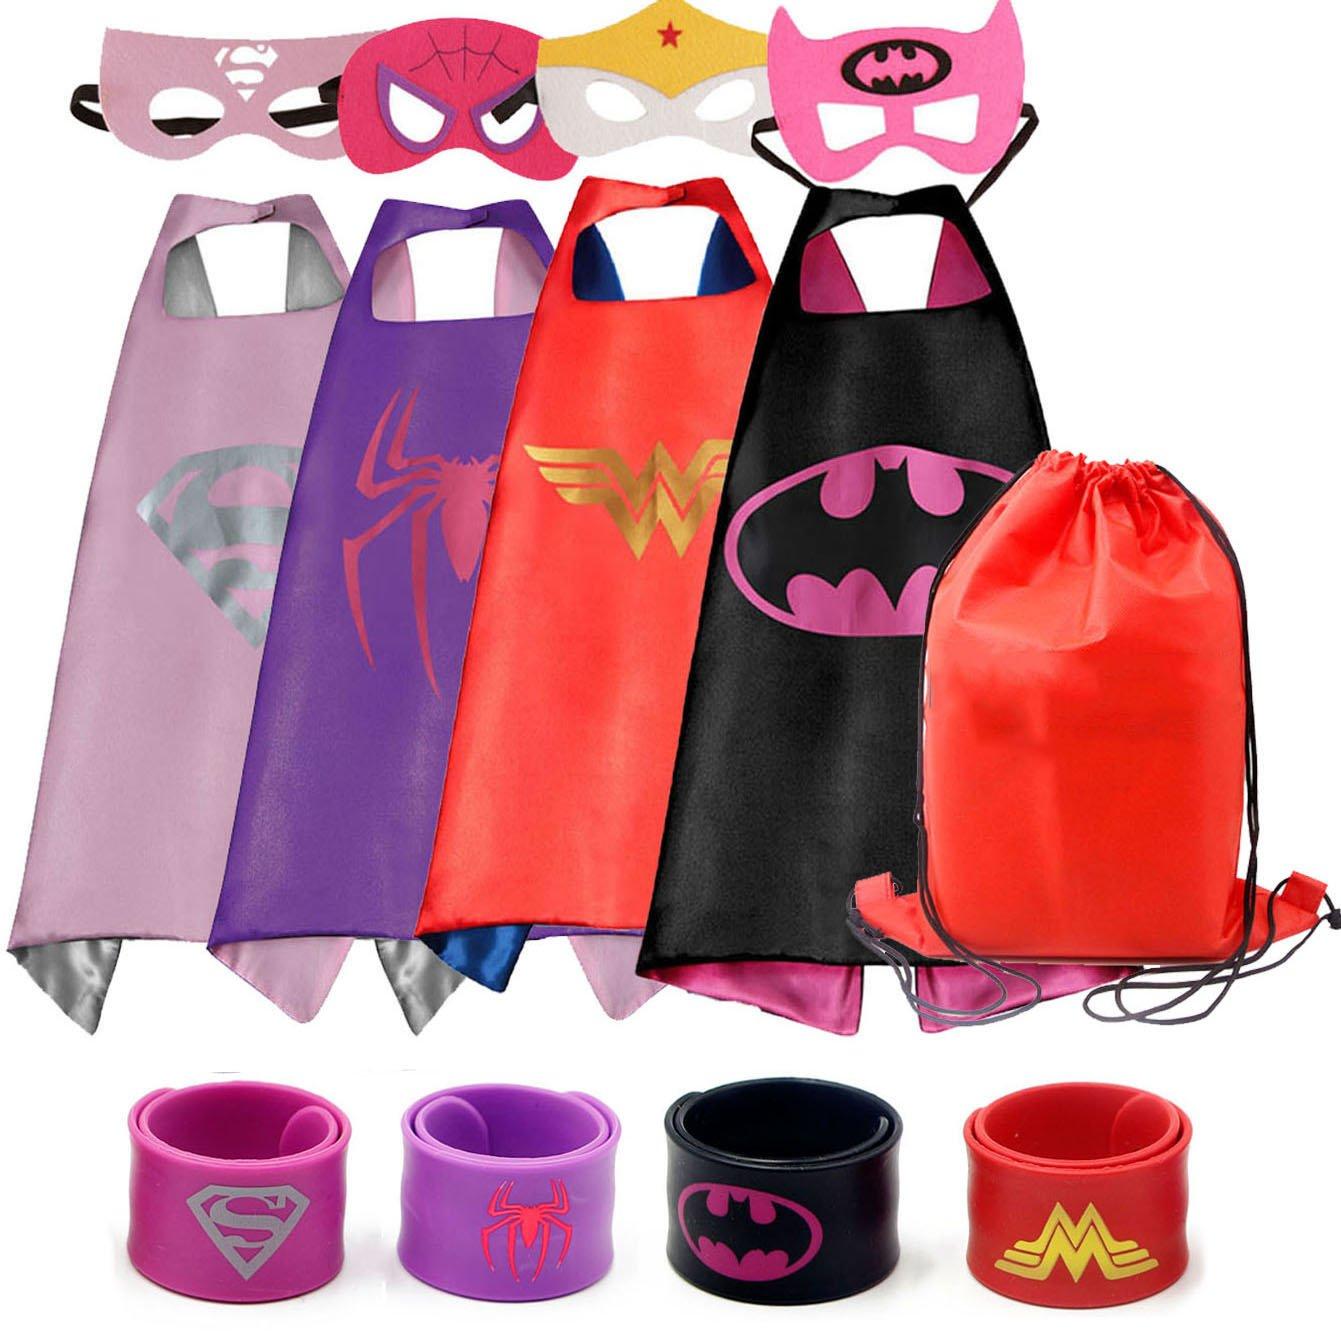 Dress up Costumes Cartoon 4-Pack Satin Capes Set with Felt Masks,Slap Bracelets and Exclusive Bag for Girls (4pcs for Girls)